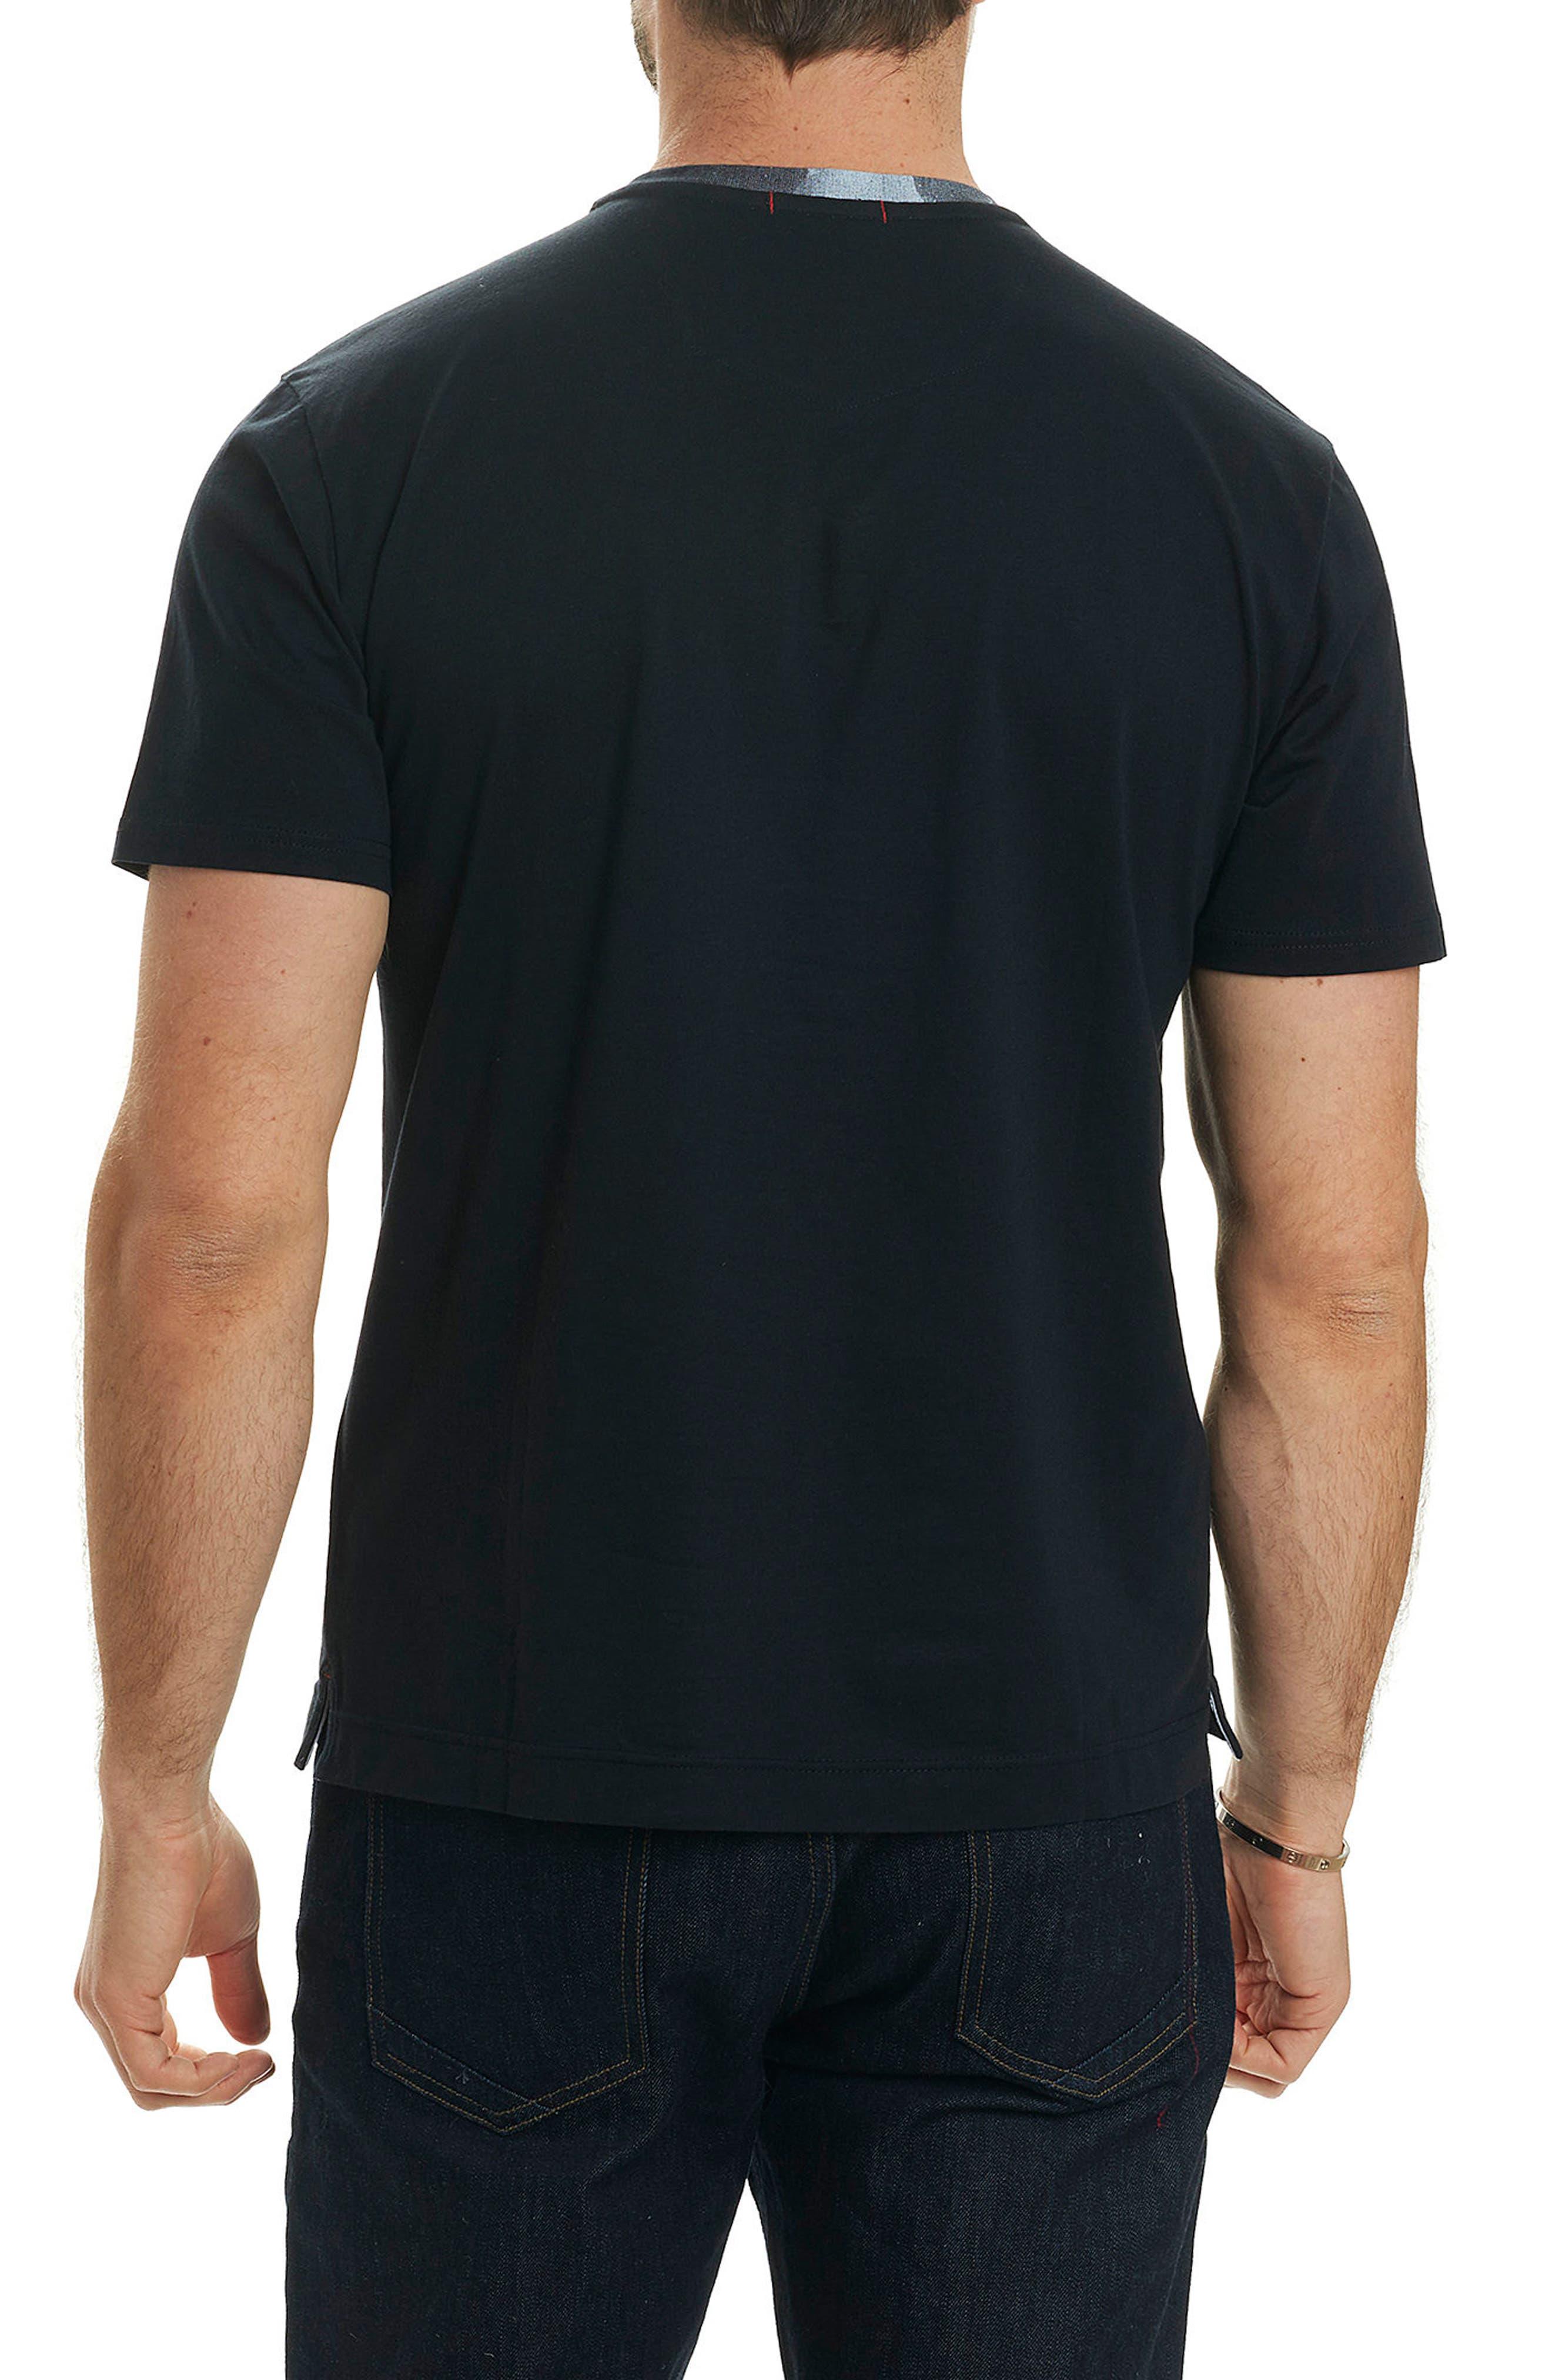 Rams Head Graphic T-Shirt,                             Alternate thumbnail 2, color,                             001